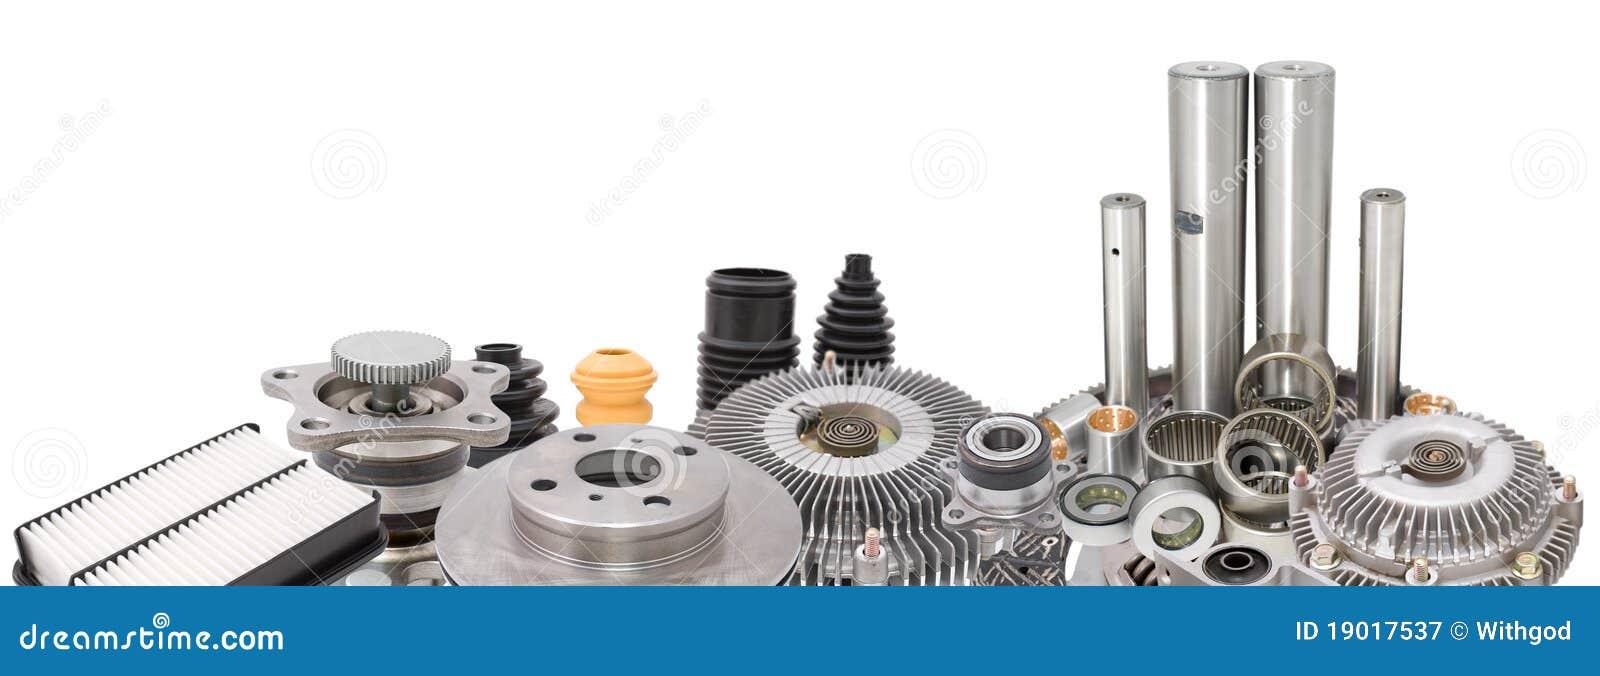 Auto parts border stock image. Image of hose, repair ...